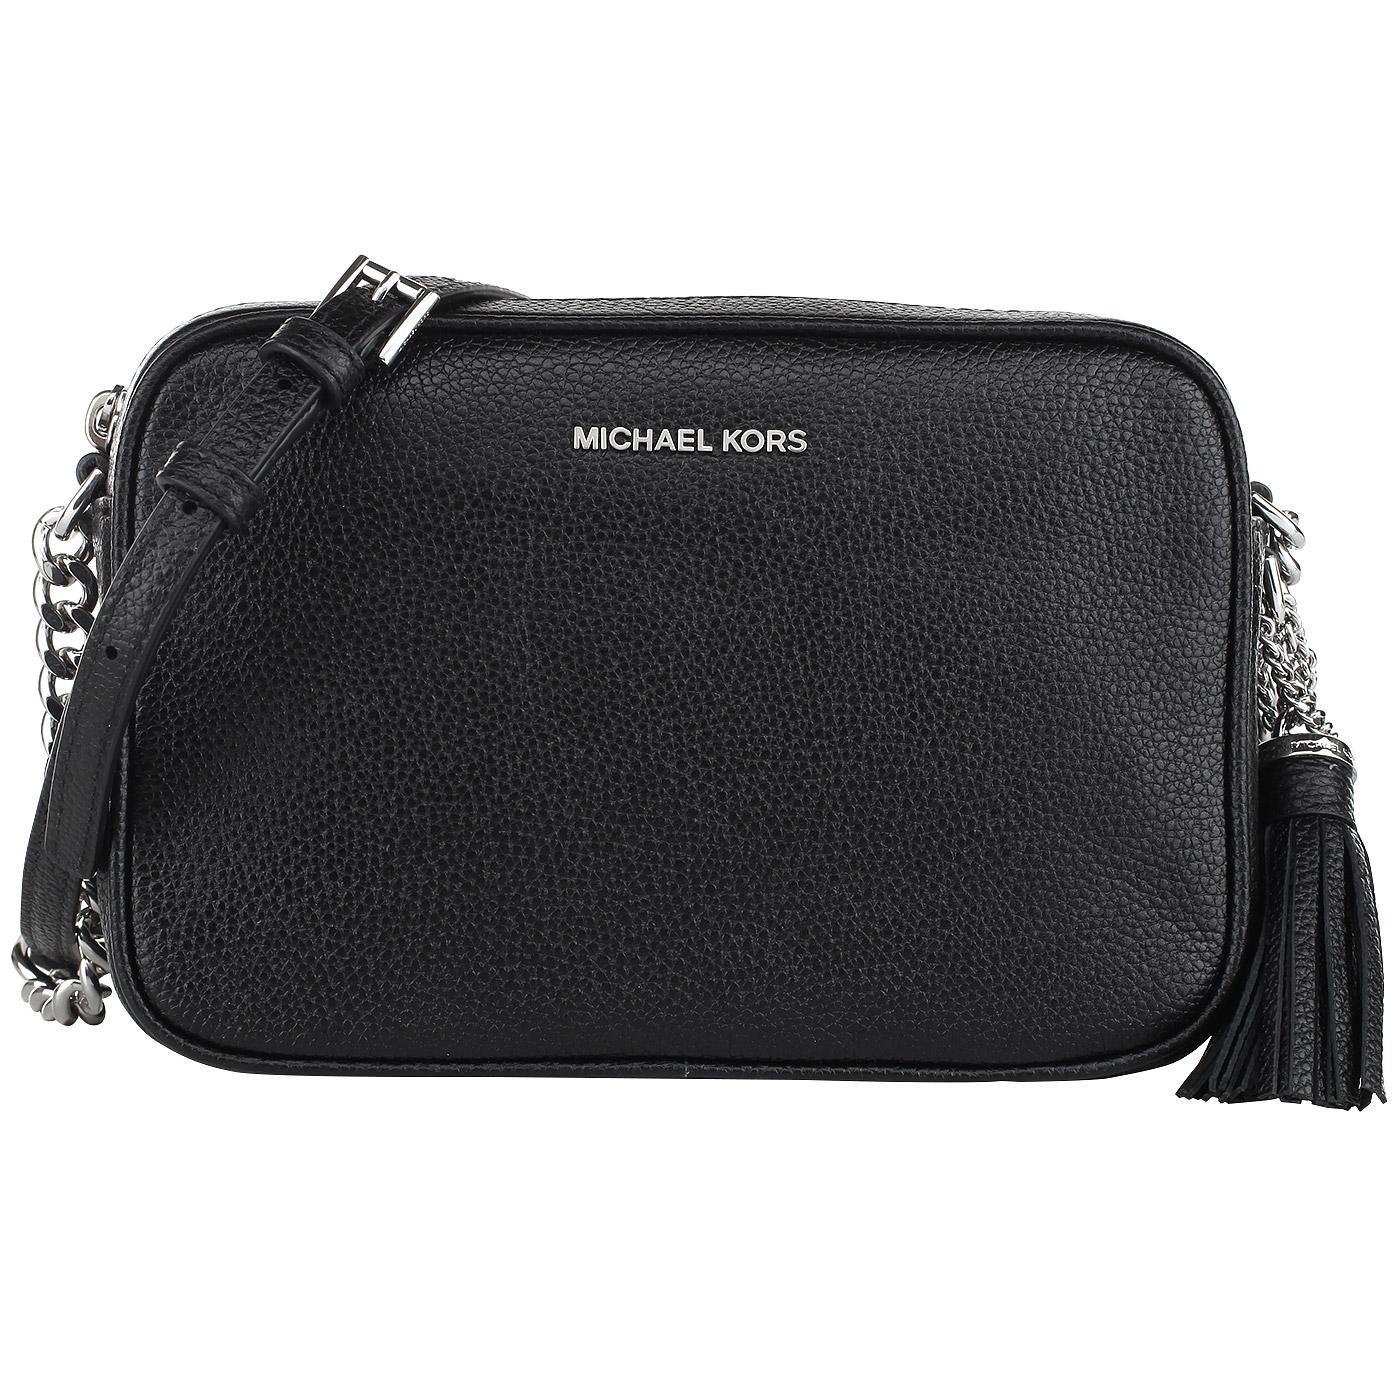 cc36cb1e4738 Женская кожаная сумочка через плечо Michael Kors Ginny 32F7SGNM8L ...